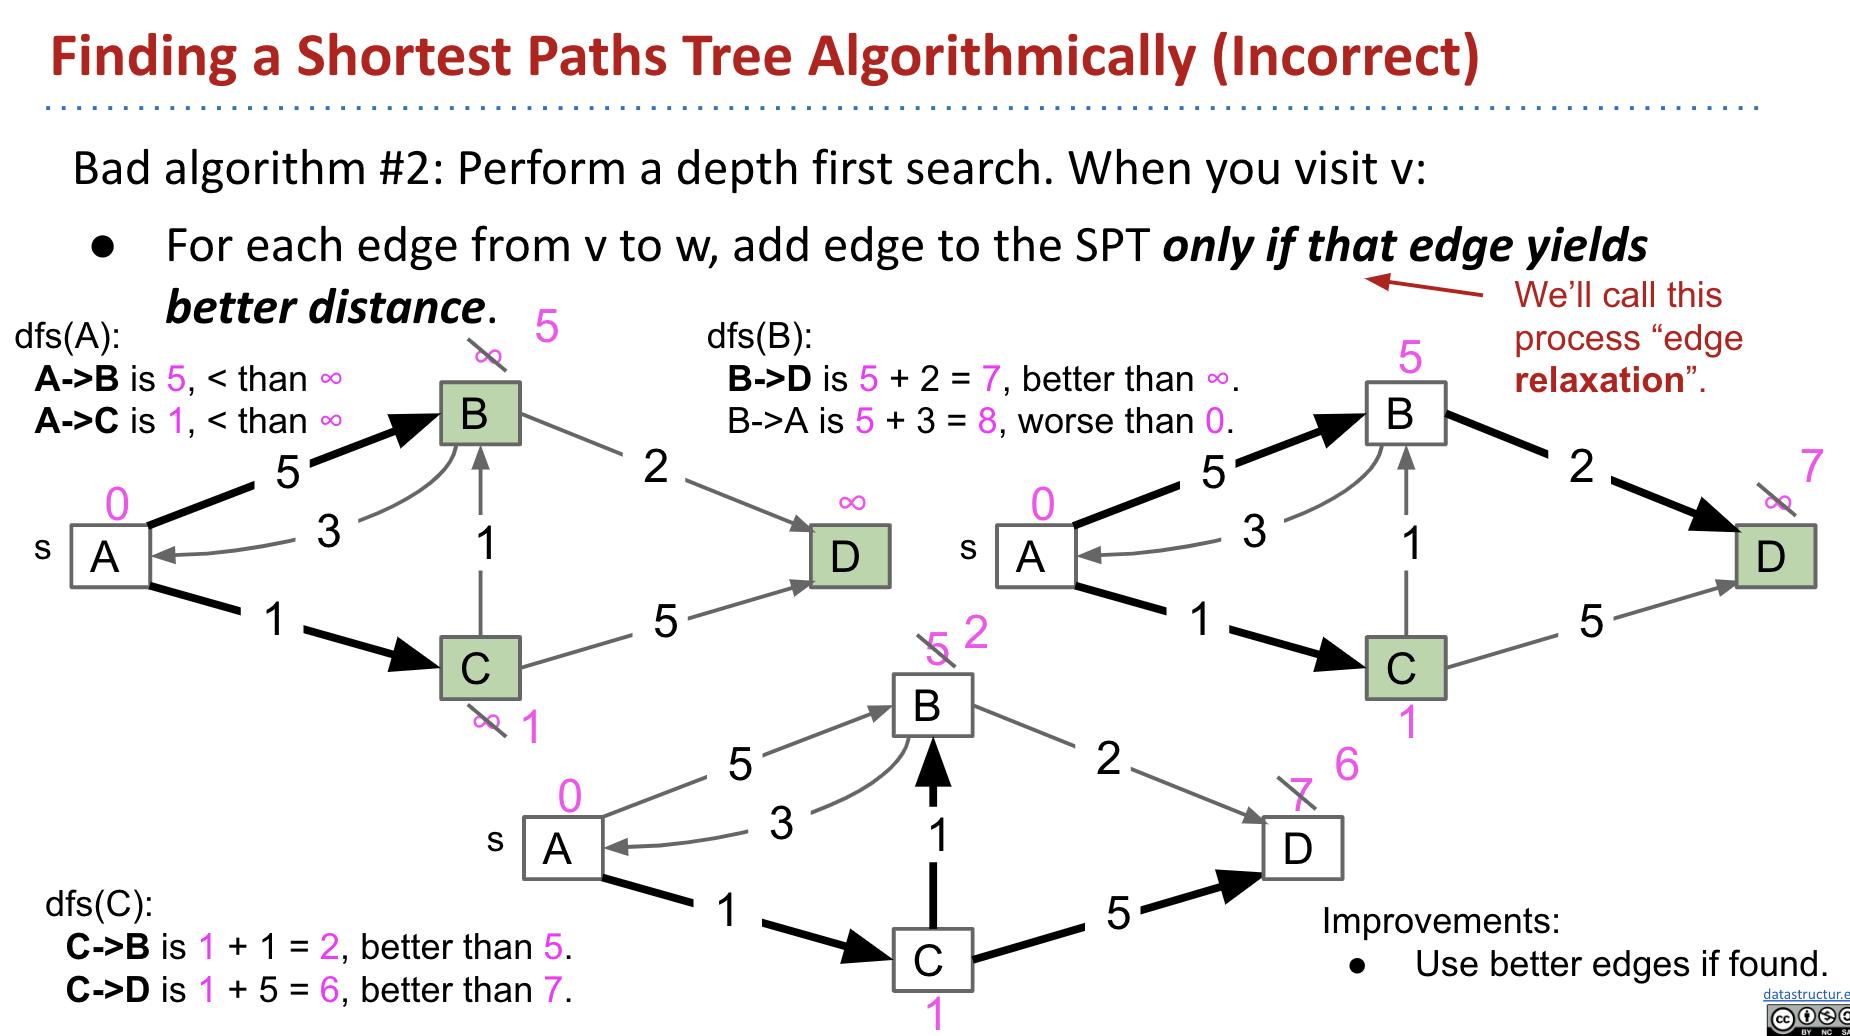 Bad Algorithm #2